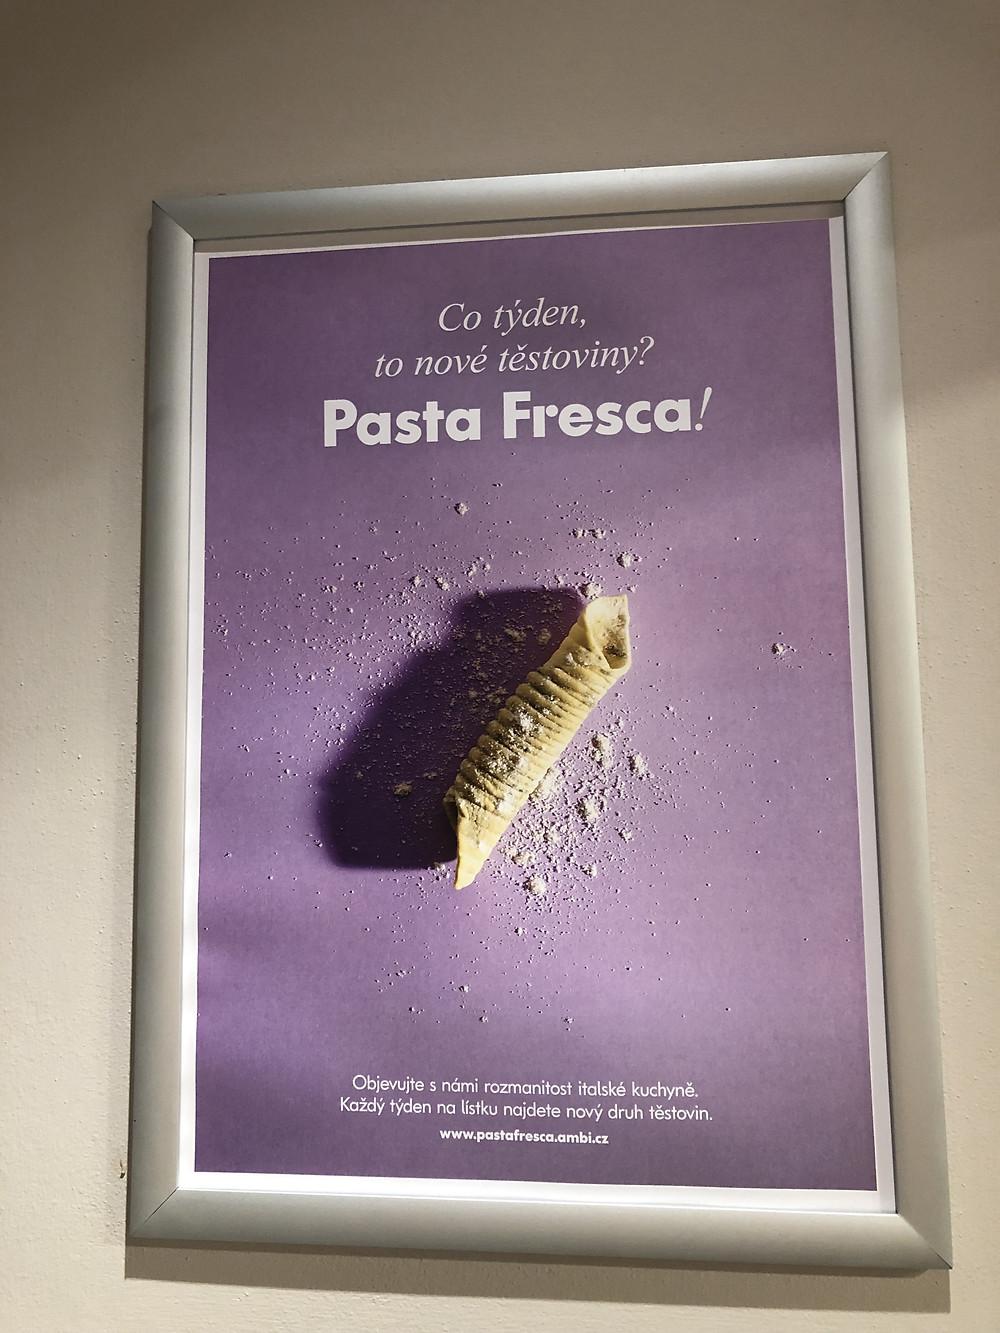 Pasta Fresca, Prague